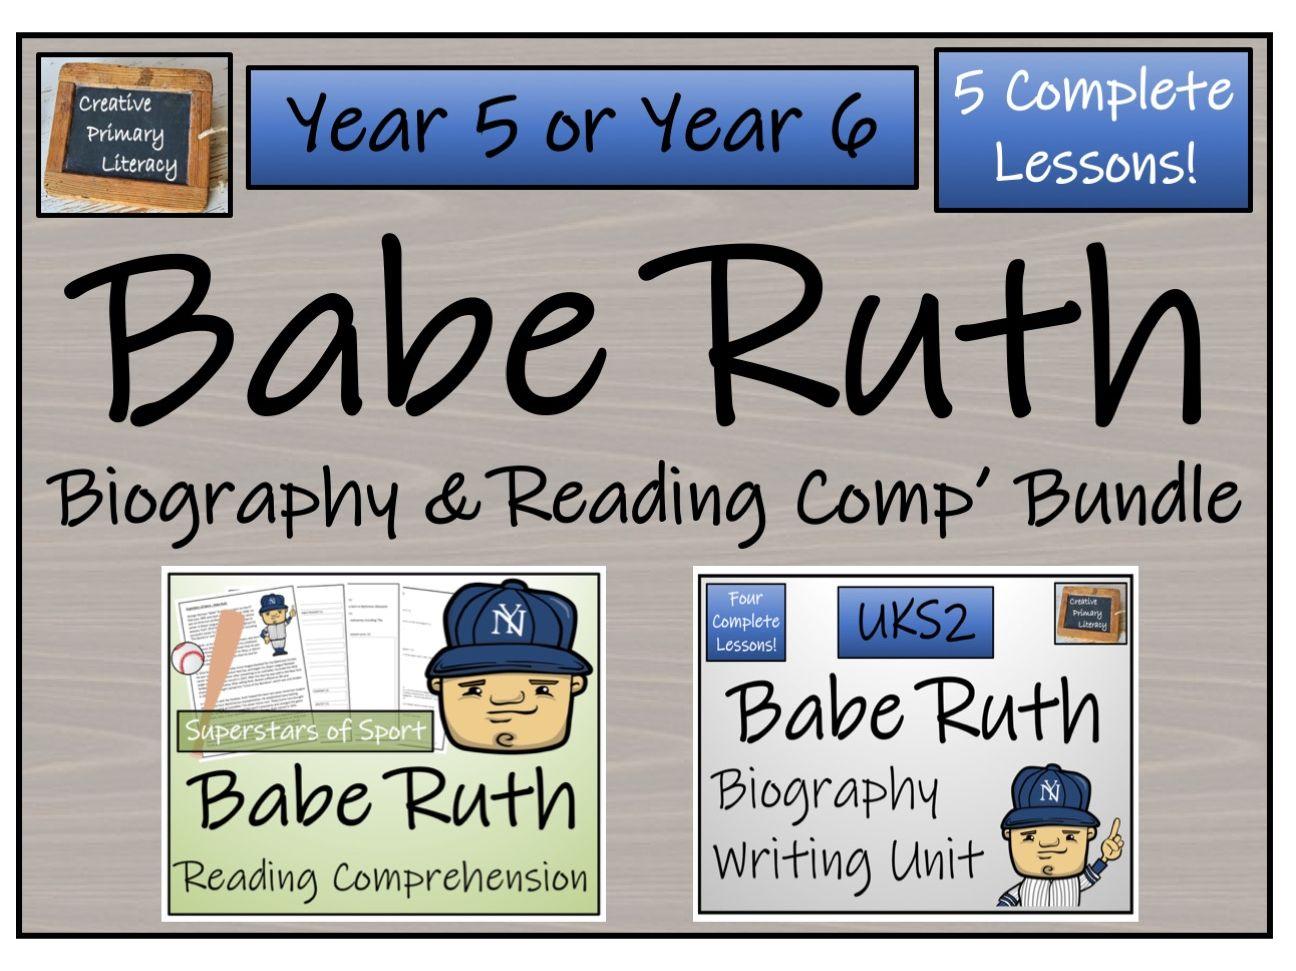 UKS2 History - Babe Ruth Reading Comprehension & Biography Bundle